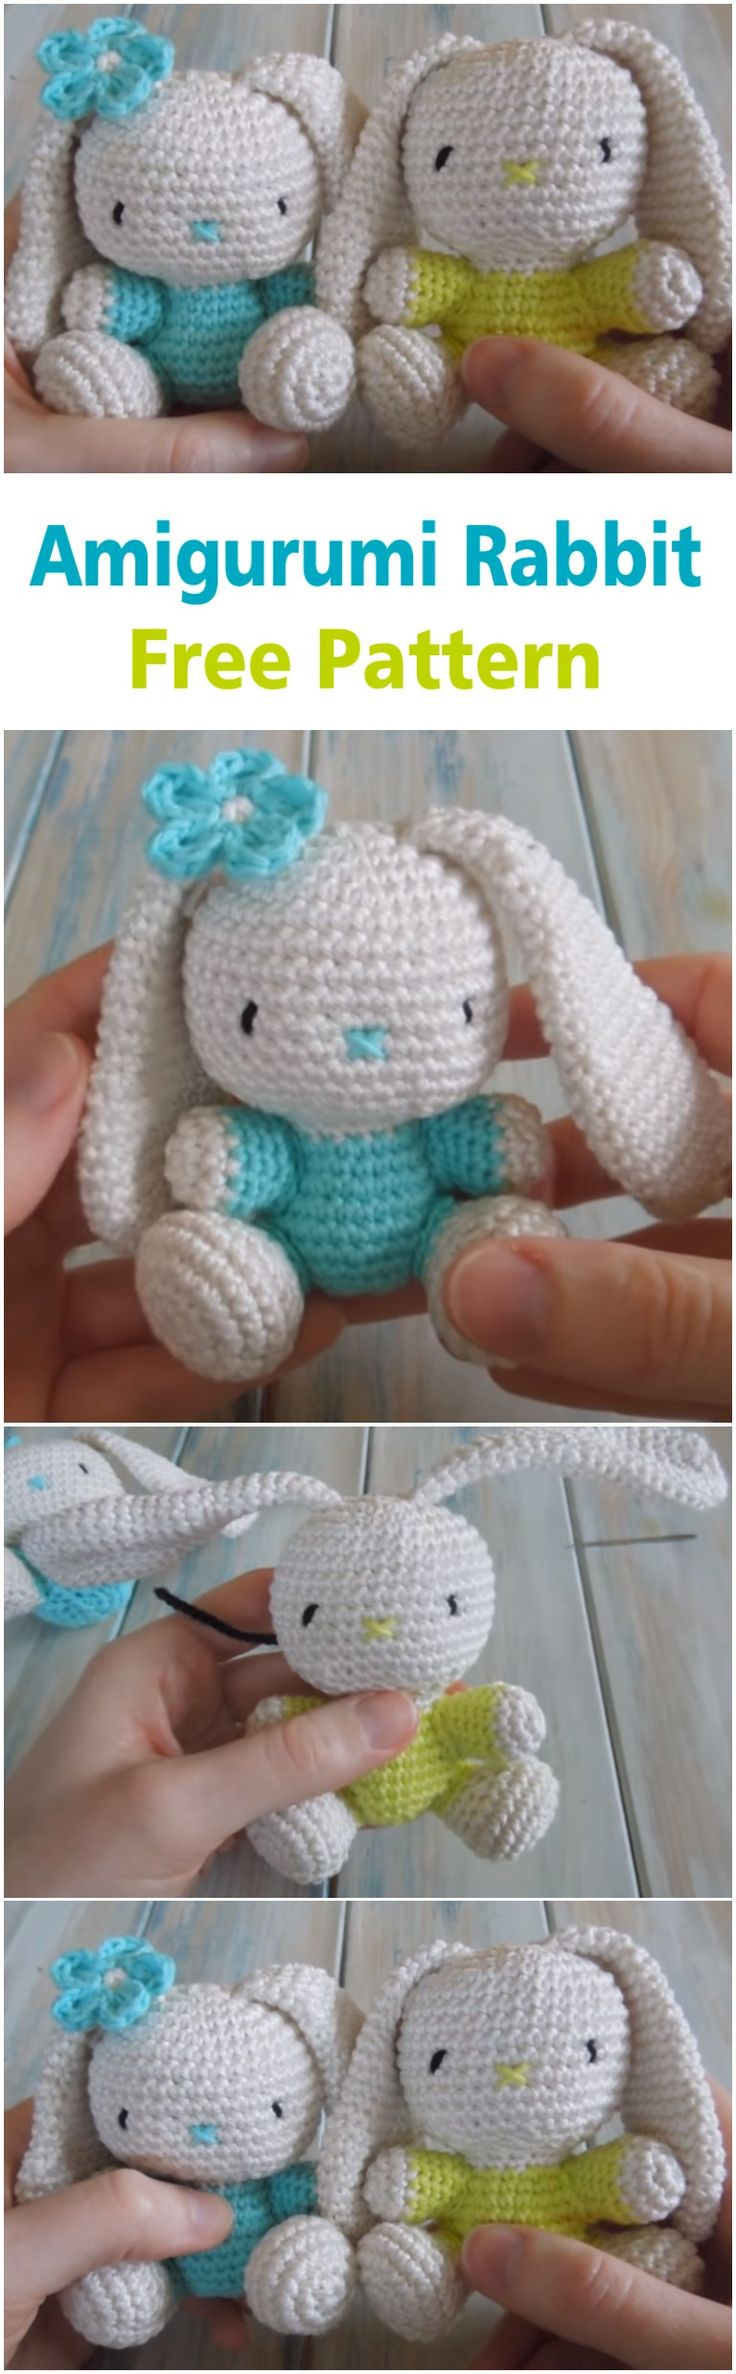 Crochet an Amigurumi Rabbit Free Pattern